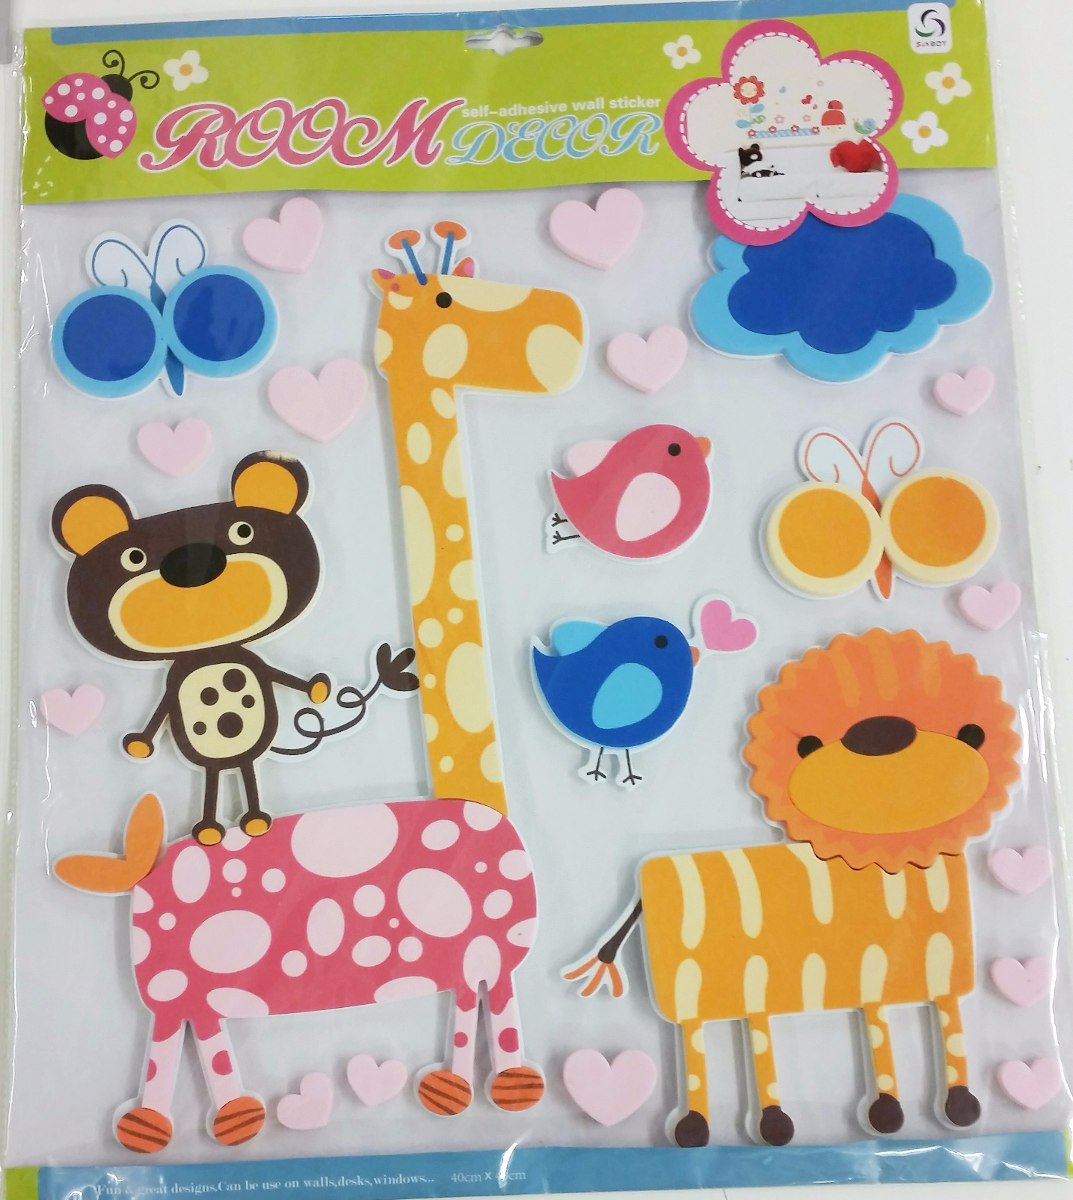 Pared infantil decoracion infantiles decoradas con - Decorar paredes infantiles con goma eva ...